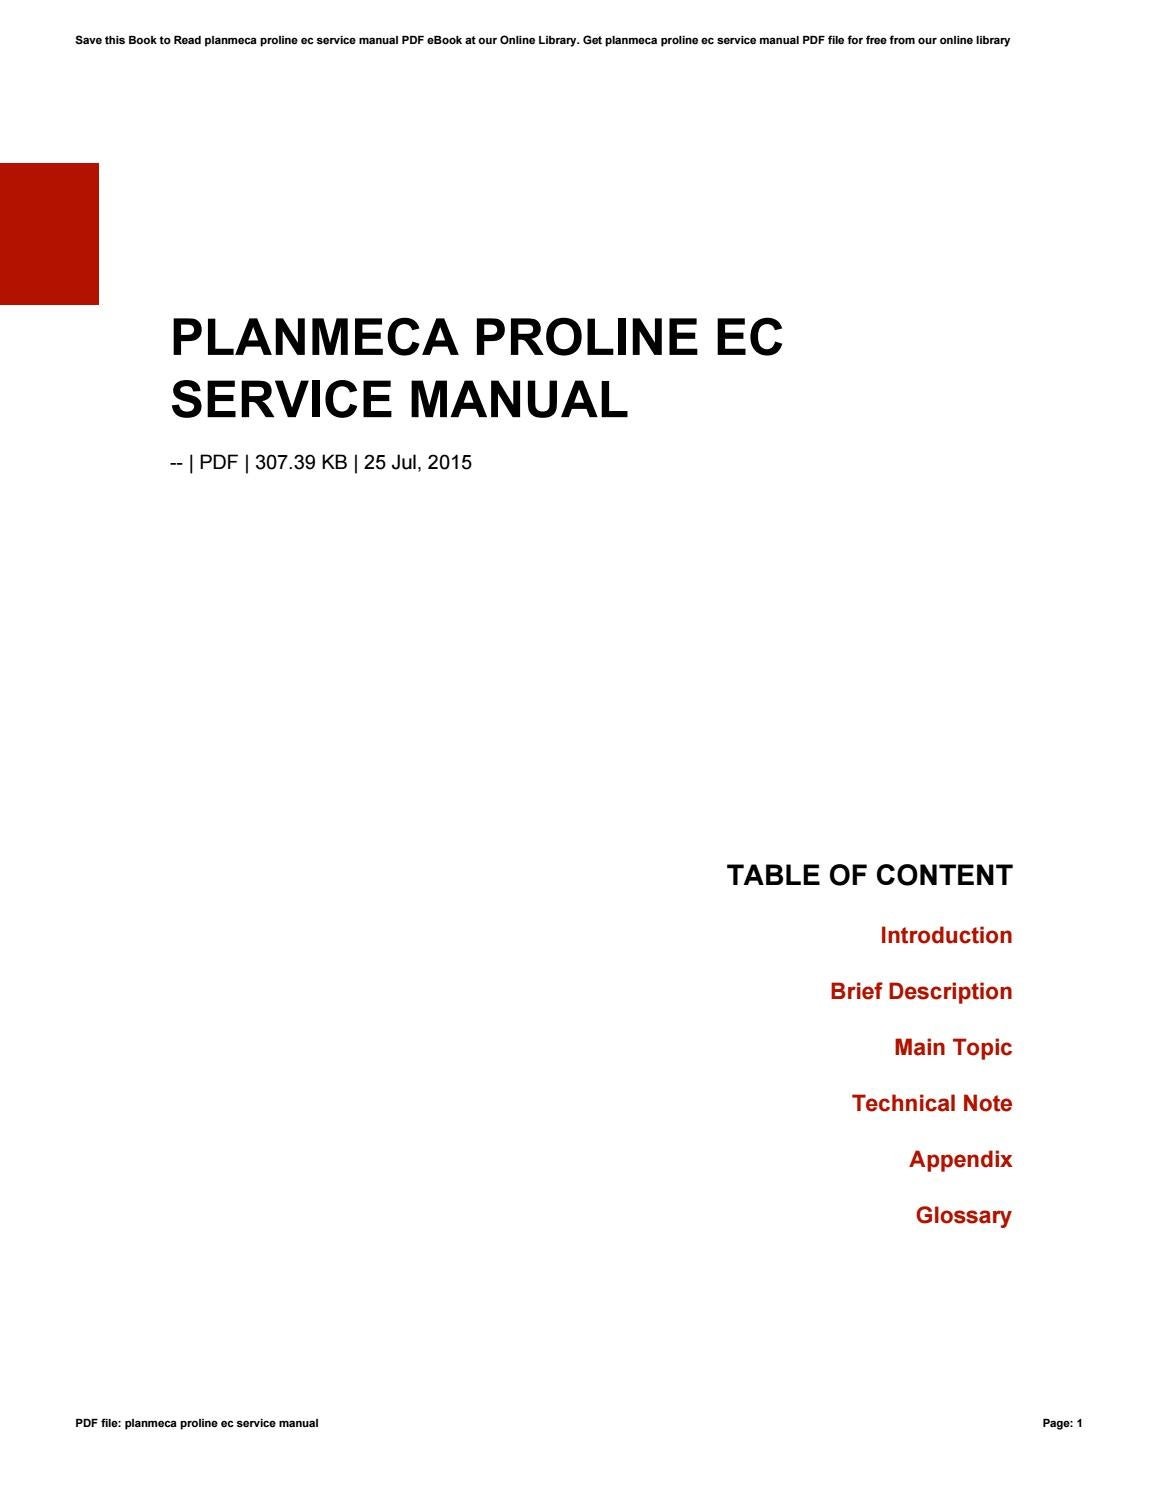 ... Array - planmeca proline ec service manual by mariacarmon2523 issuu rh  issuu ...